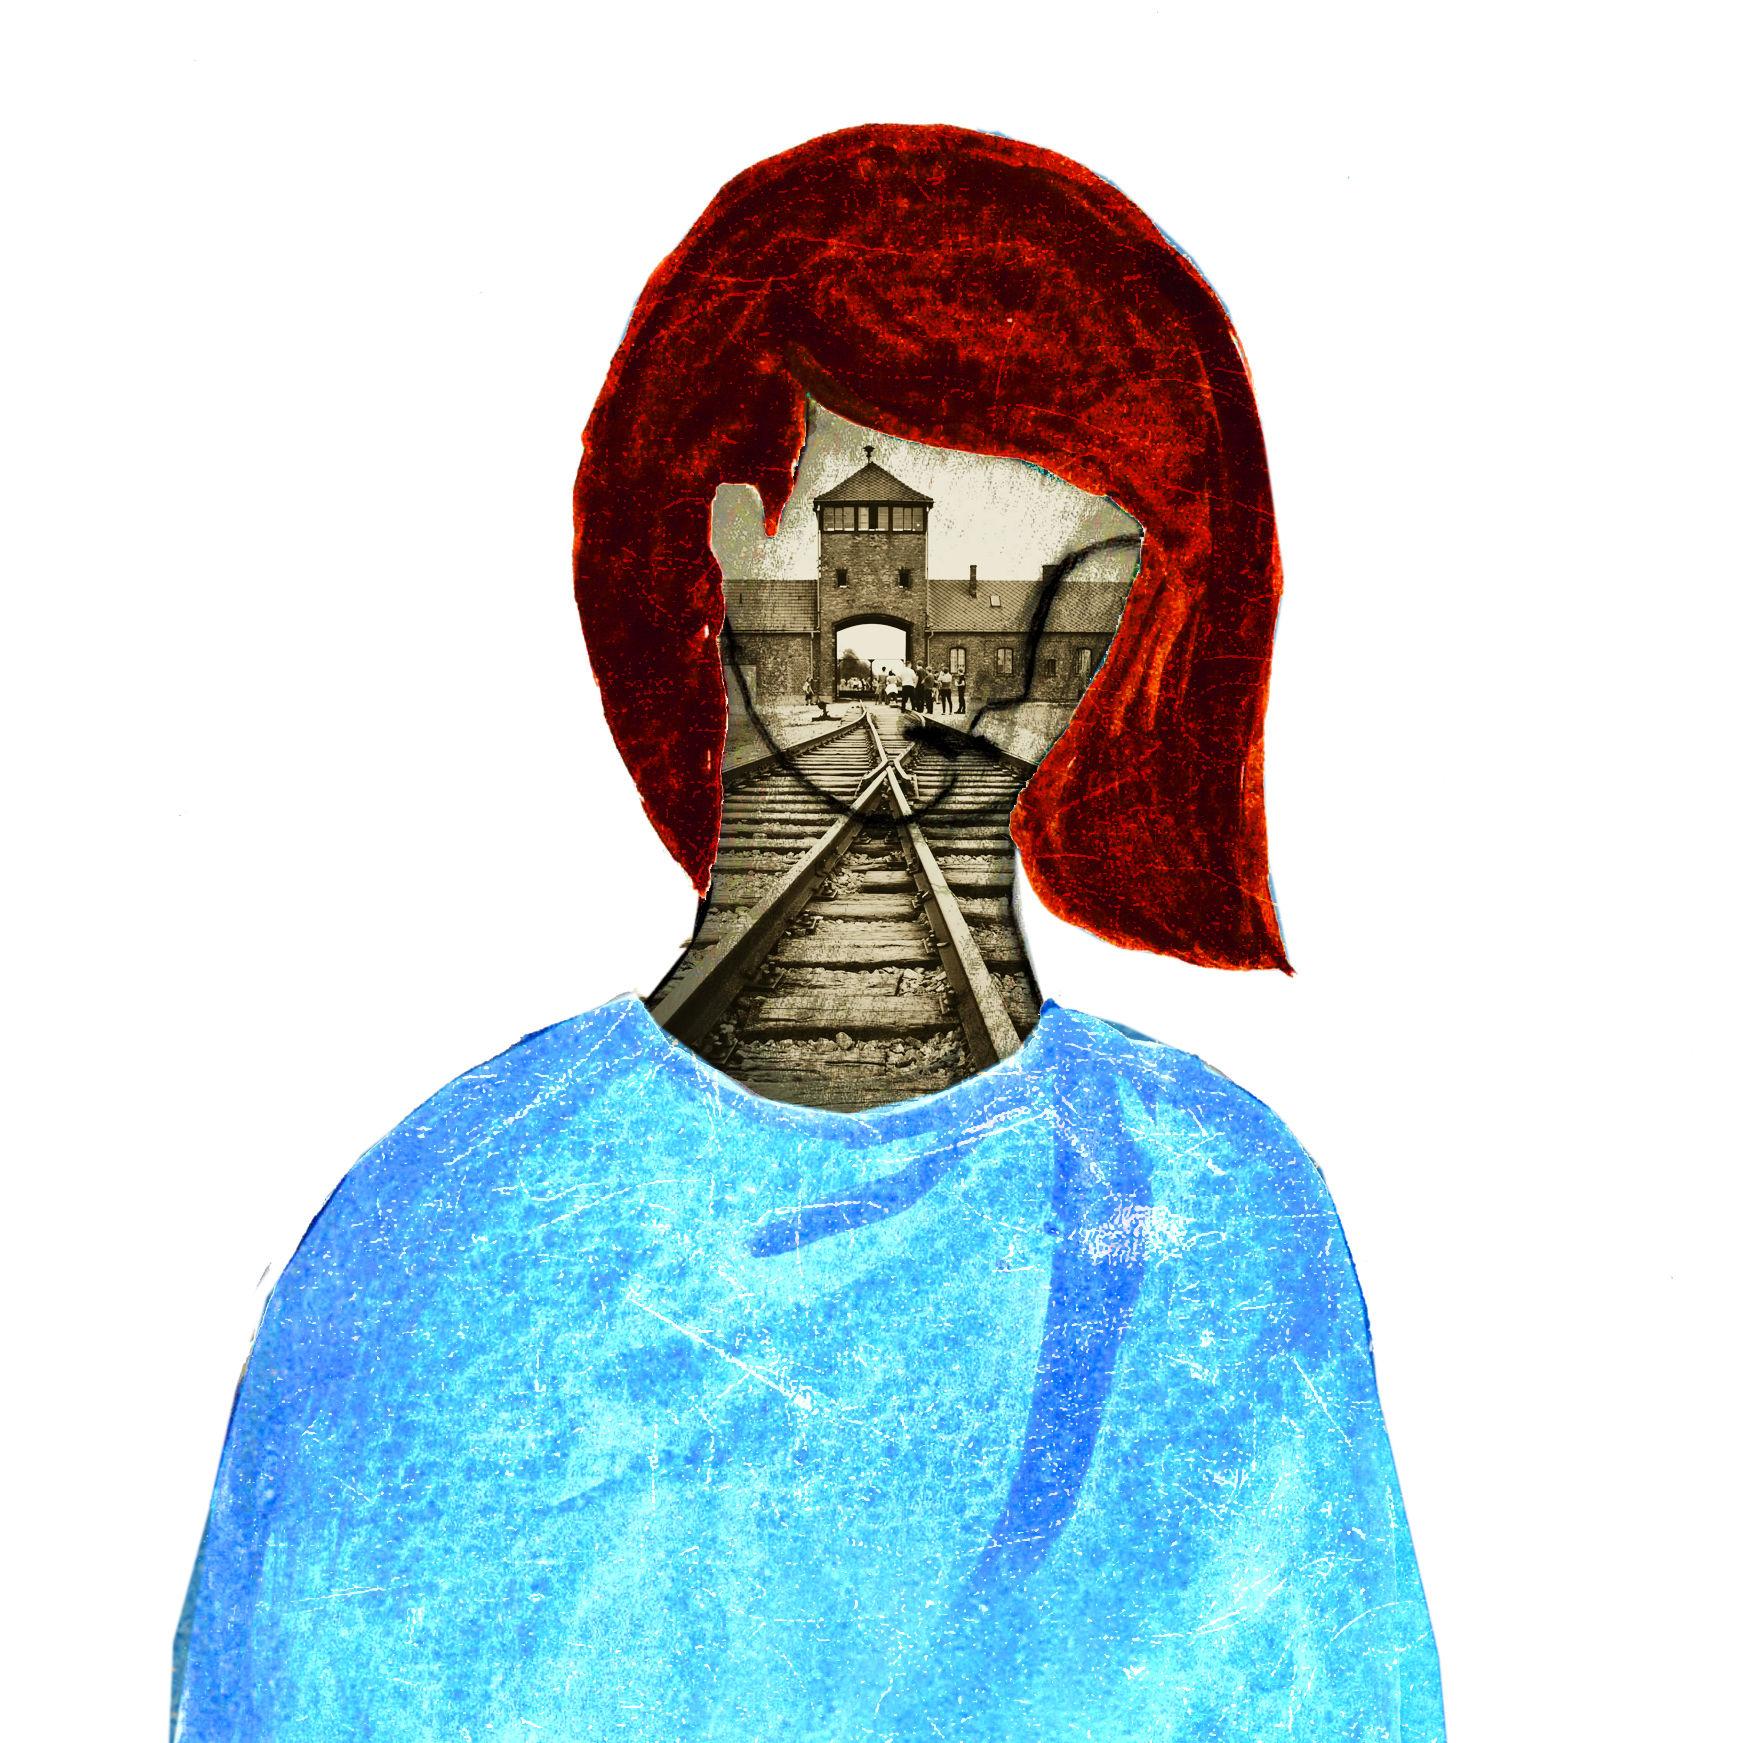 Jis 0616 holocaust illustration vccdgm